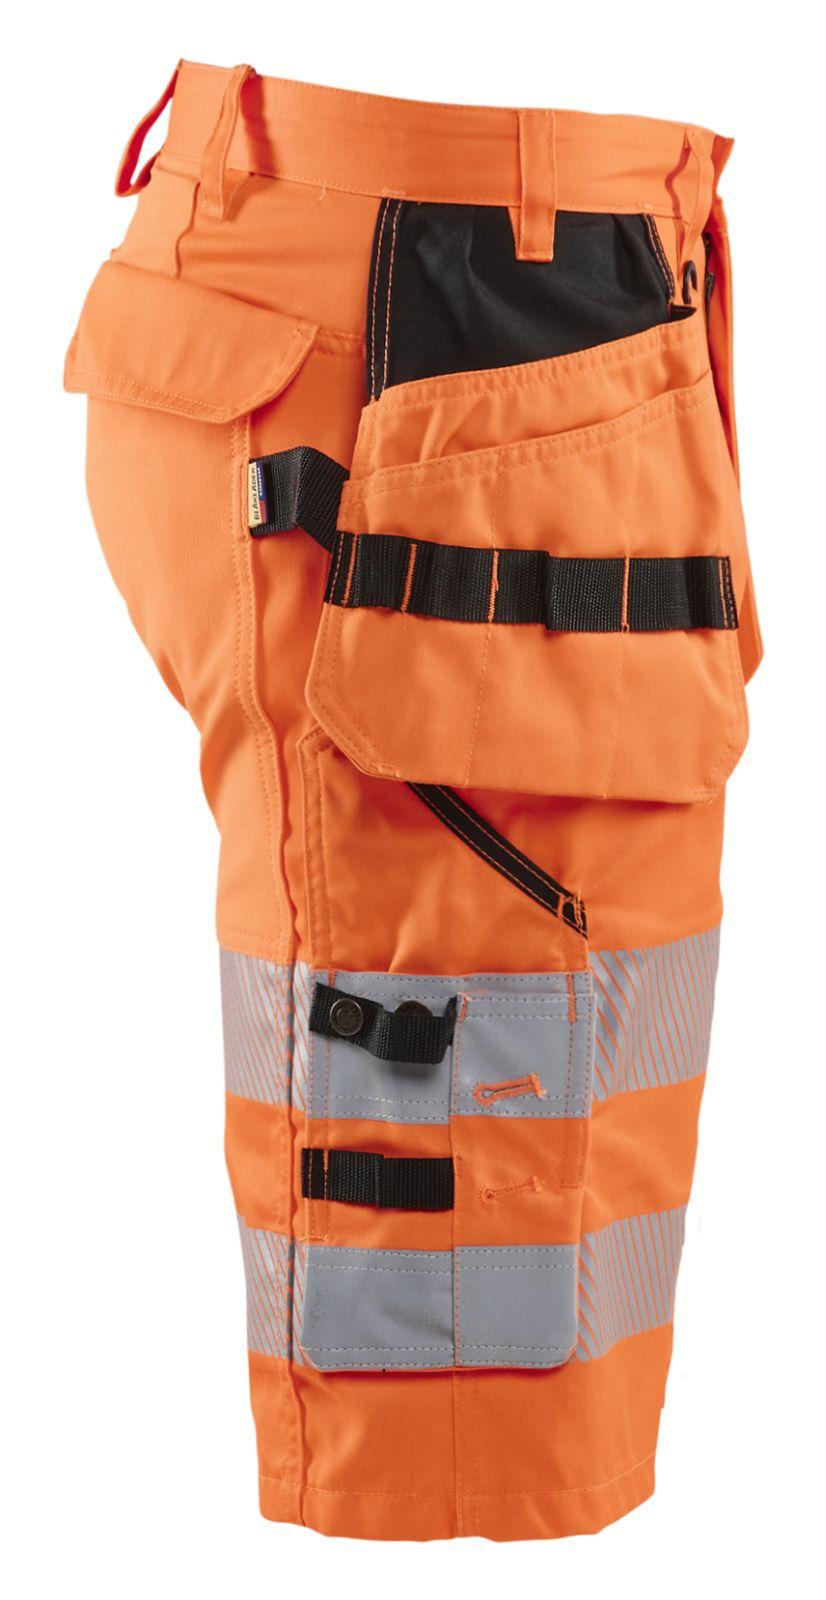 Blaklader Korte werkbroeken 15861811 High Vis fluo-oranje(5300)